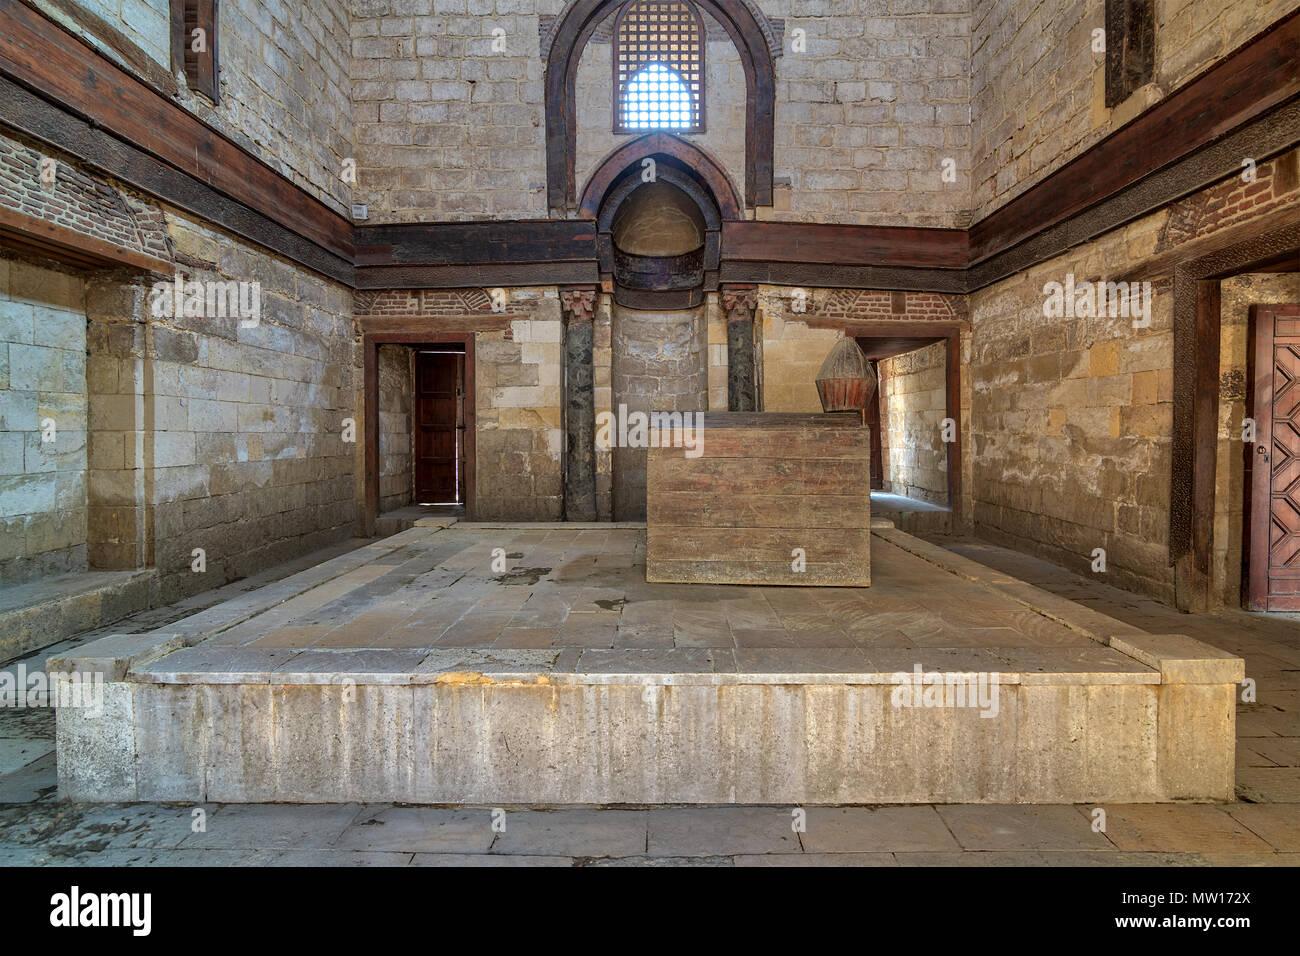 Interior of Mausoleum of al-Nasir Muhammad Ibn Qalawun, Al Muizz Street, Old Cairo, Egypt - Stock Image